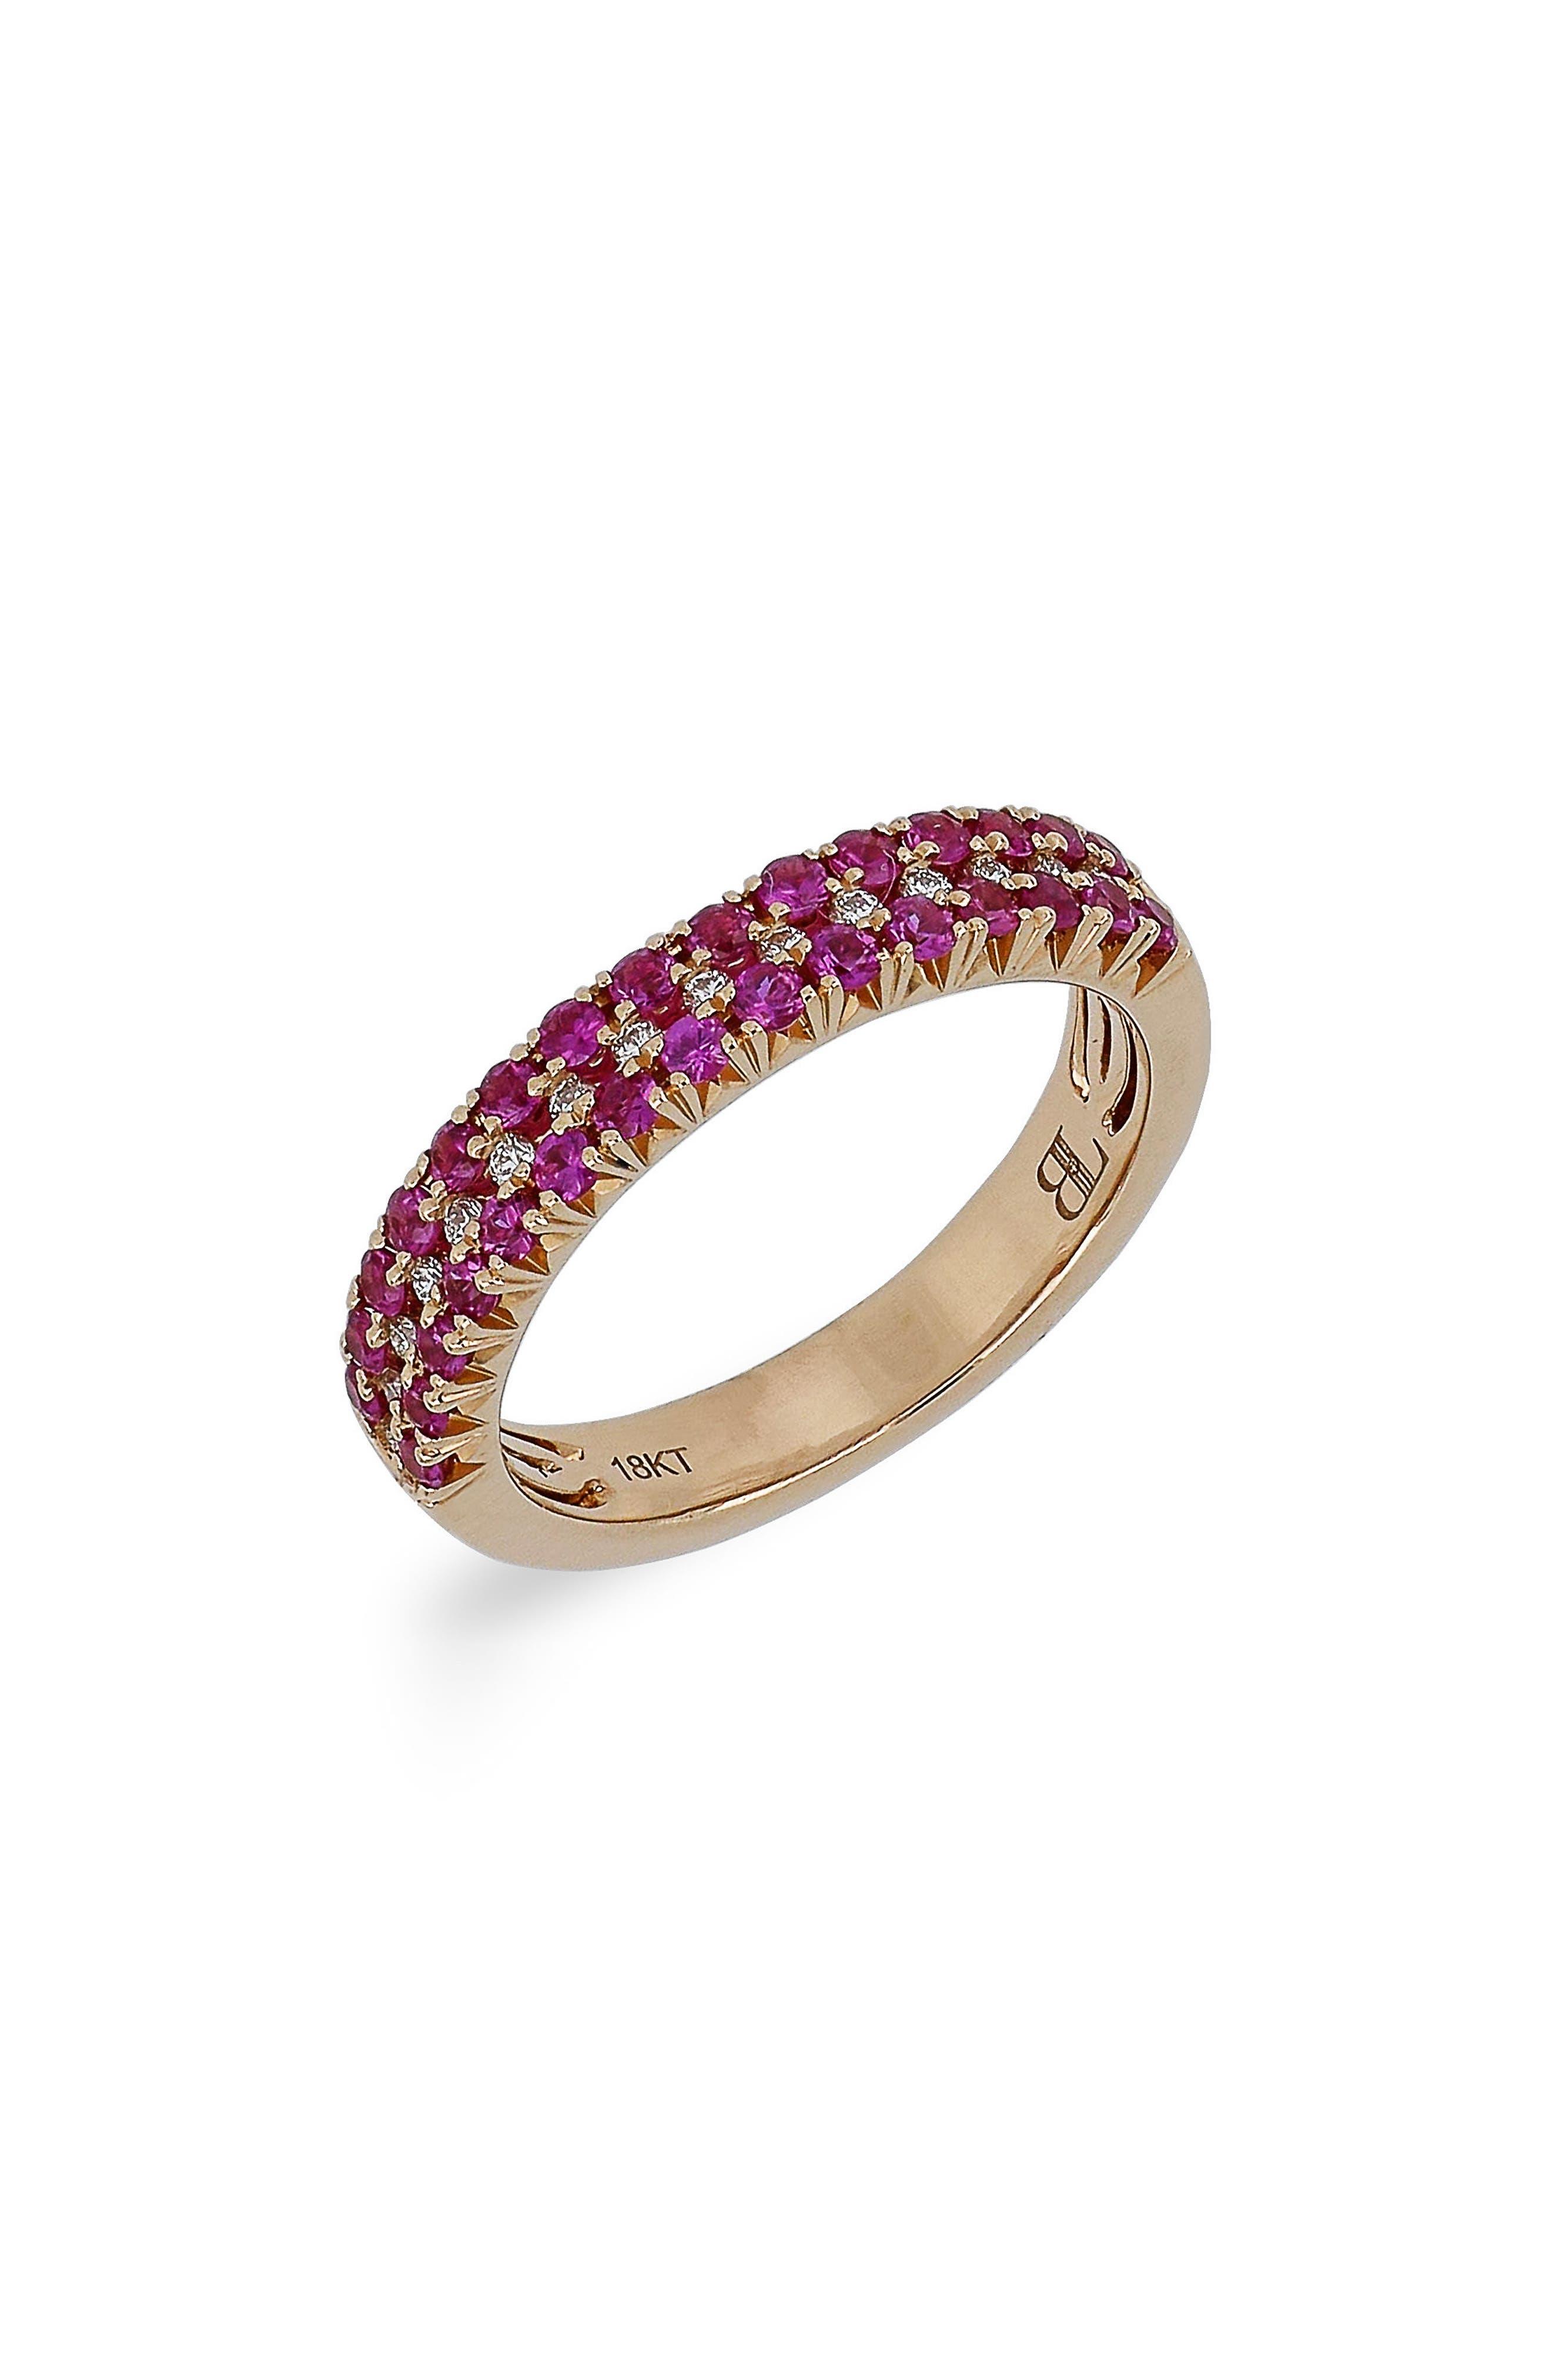 Ruby & Diamond Ring,                             Main thumbnail 1, color,                             712